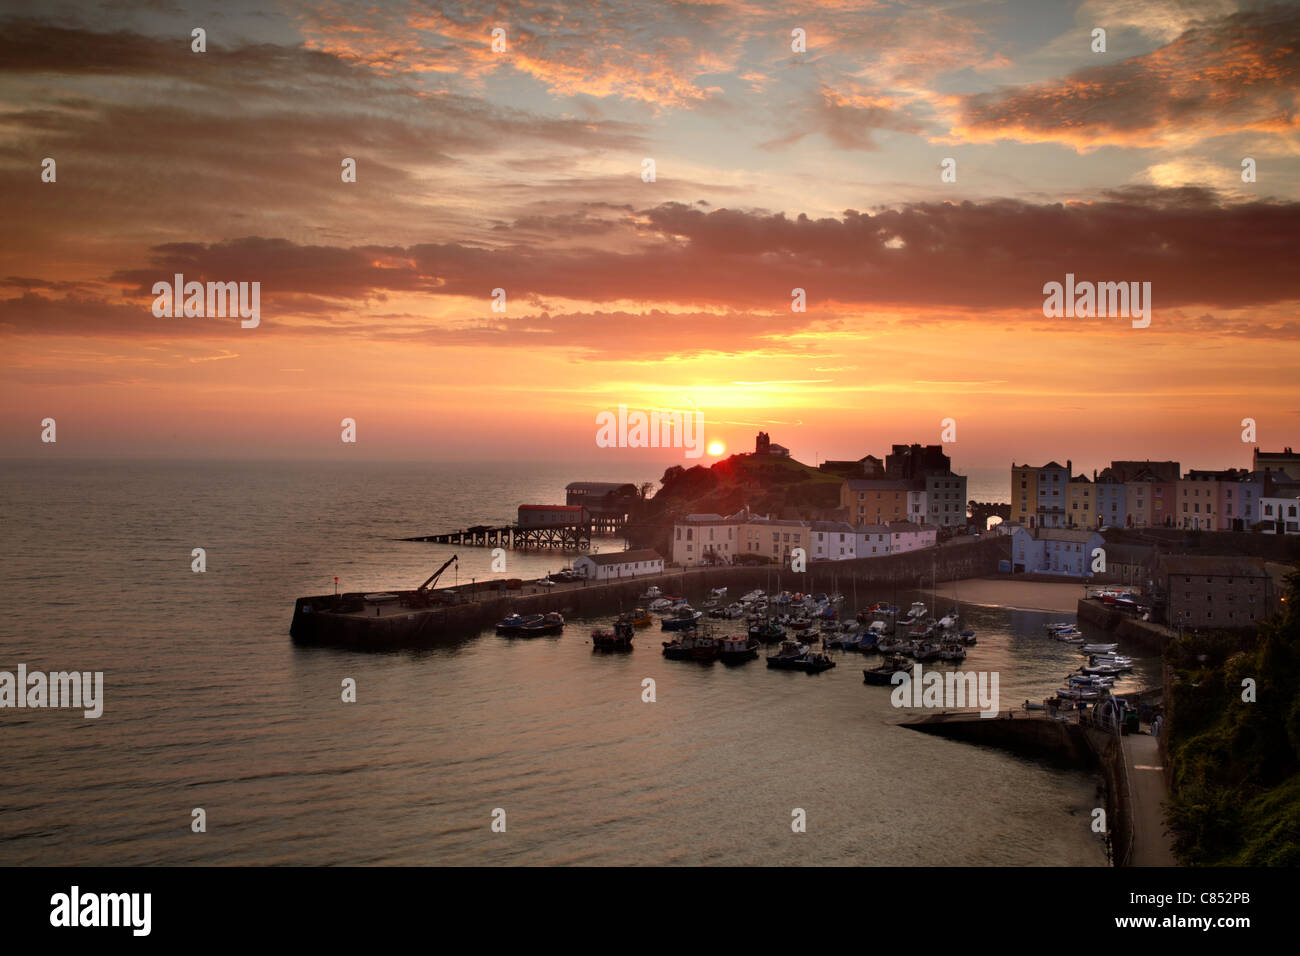 Tenby harbour, Pembrokeshire, at sunrise. - Stock Image